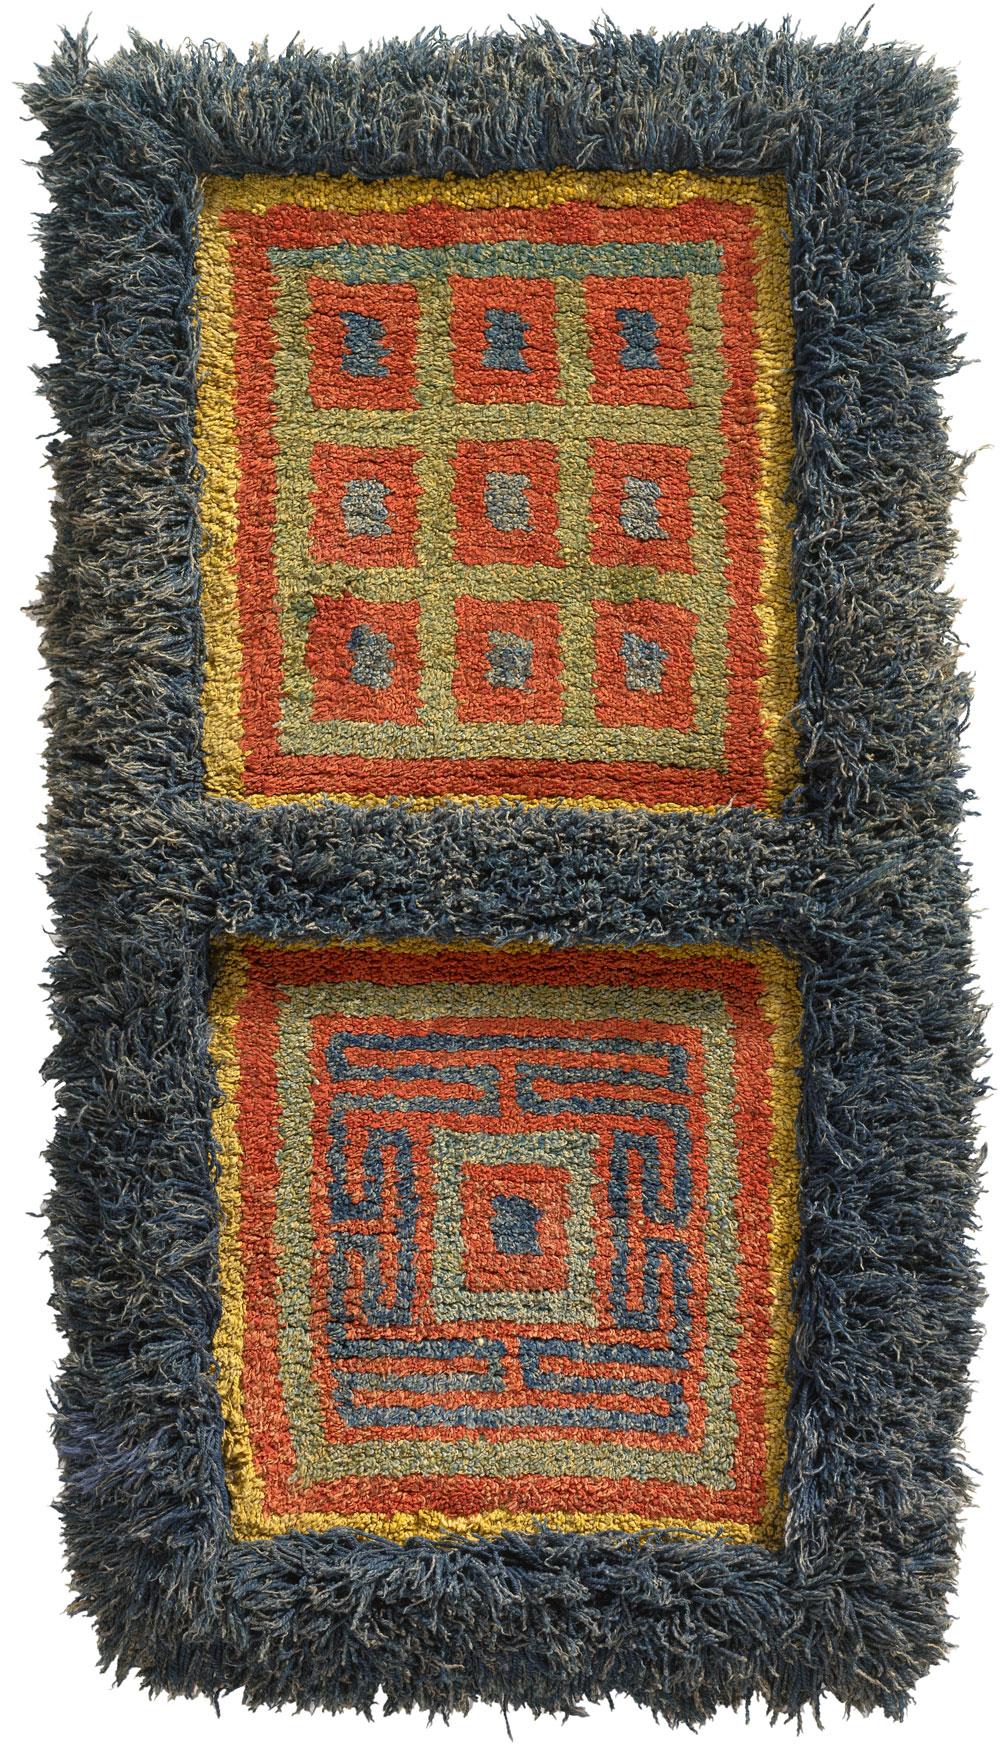 Tibetan rugs at Cologne Fine Art 2014, Wangden warp face back rug, 19th century, 156 x 74 cm